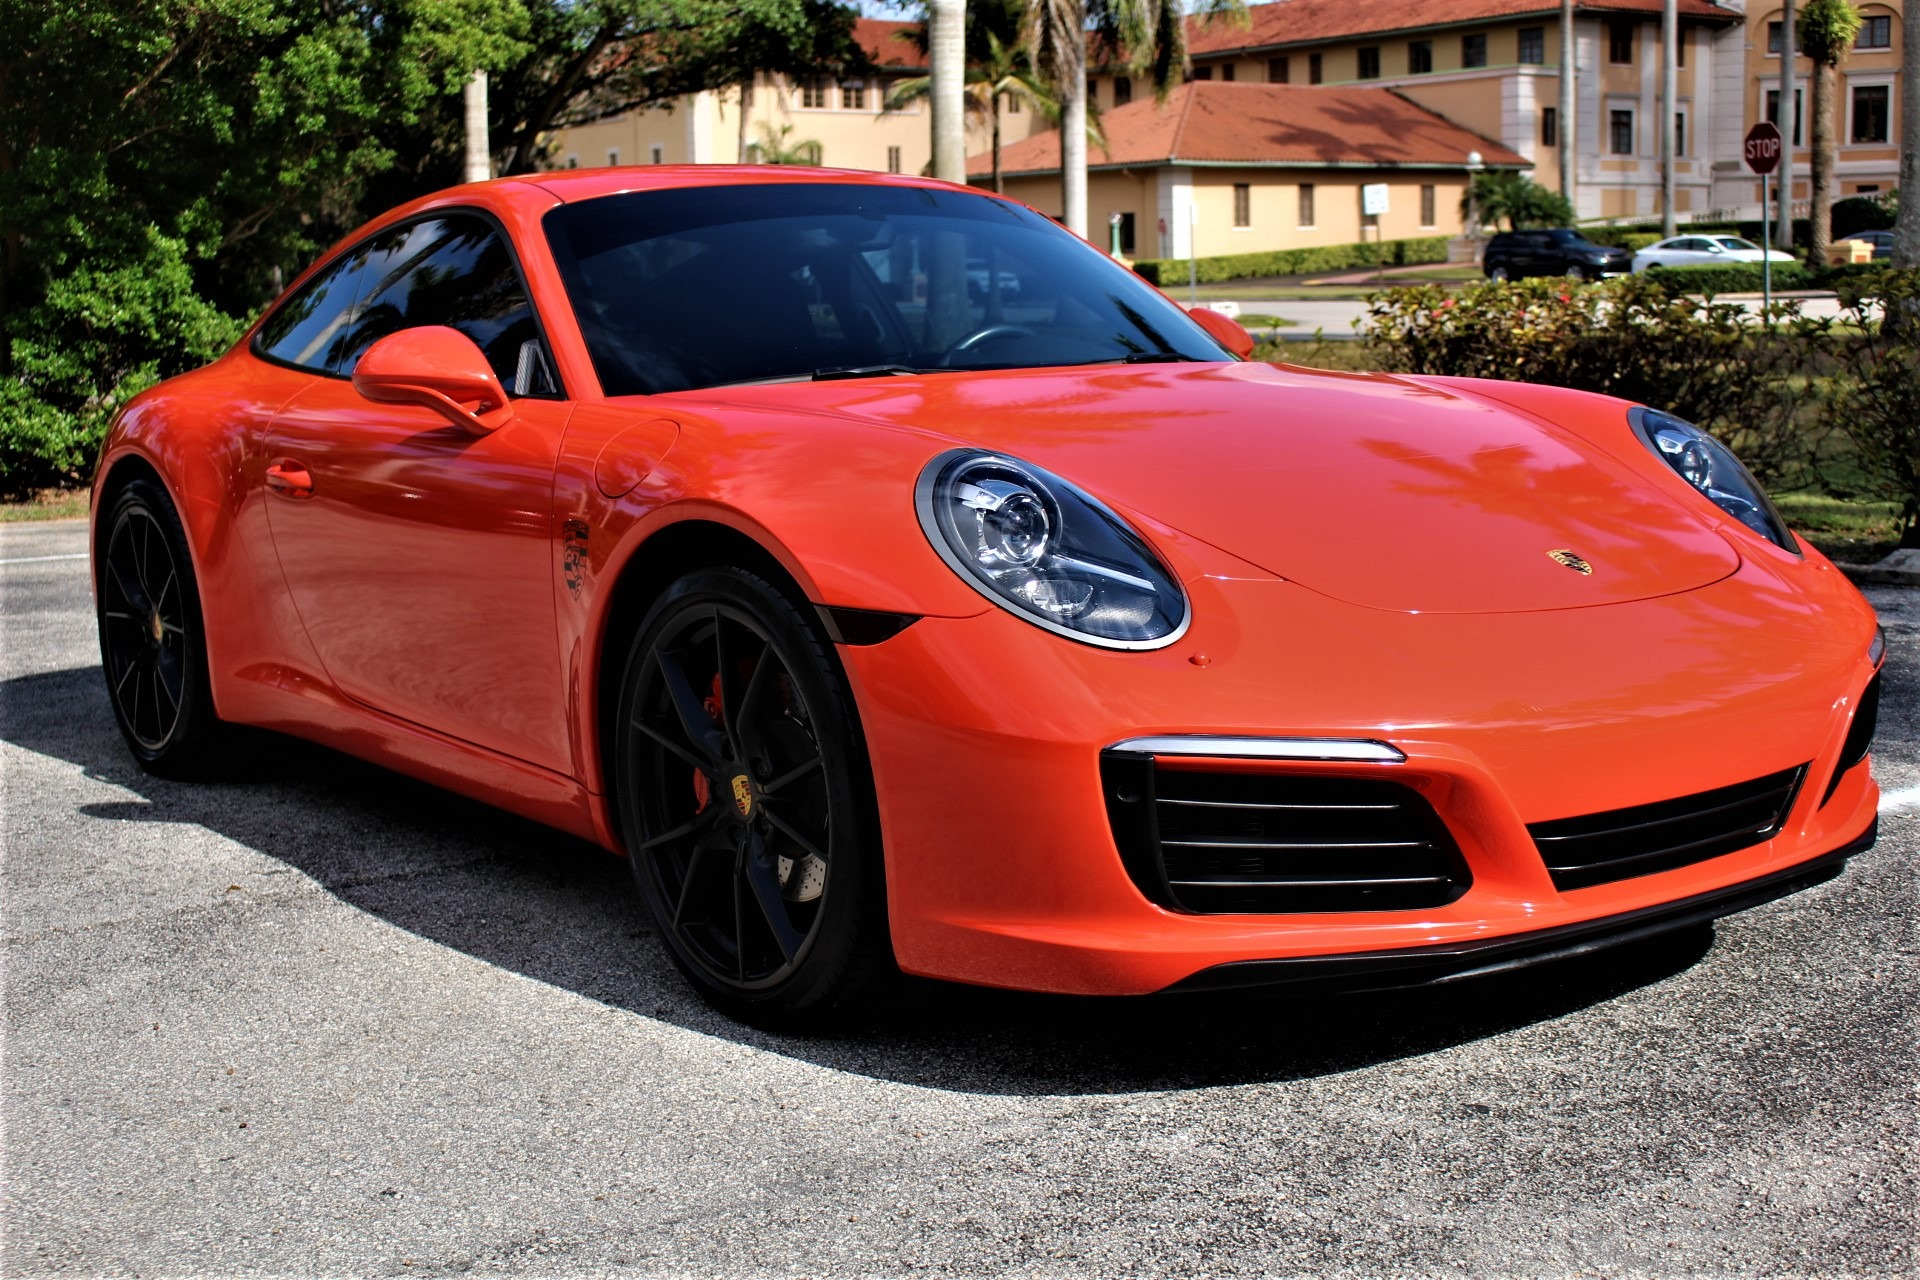 Used 2017 Porsche 911 Carrera for sale $78,850 at The Gables Sports Cars in Miami FL 33146 4